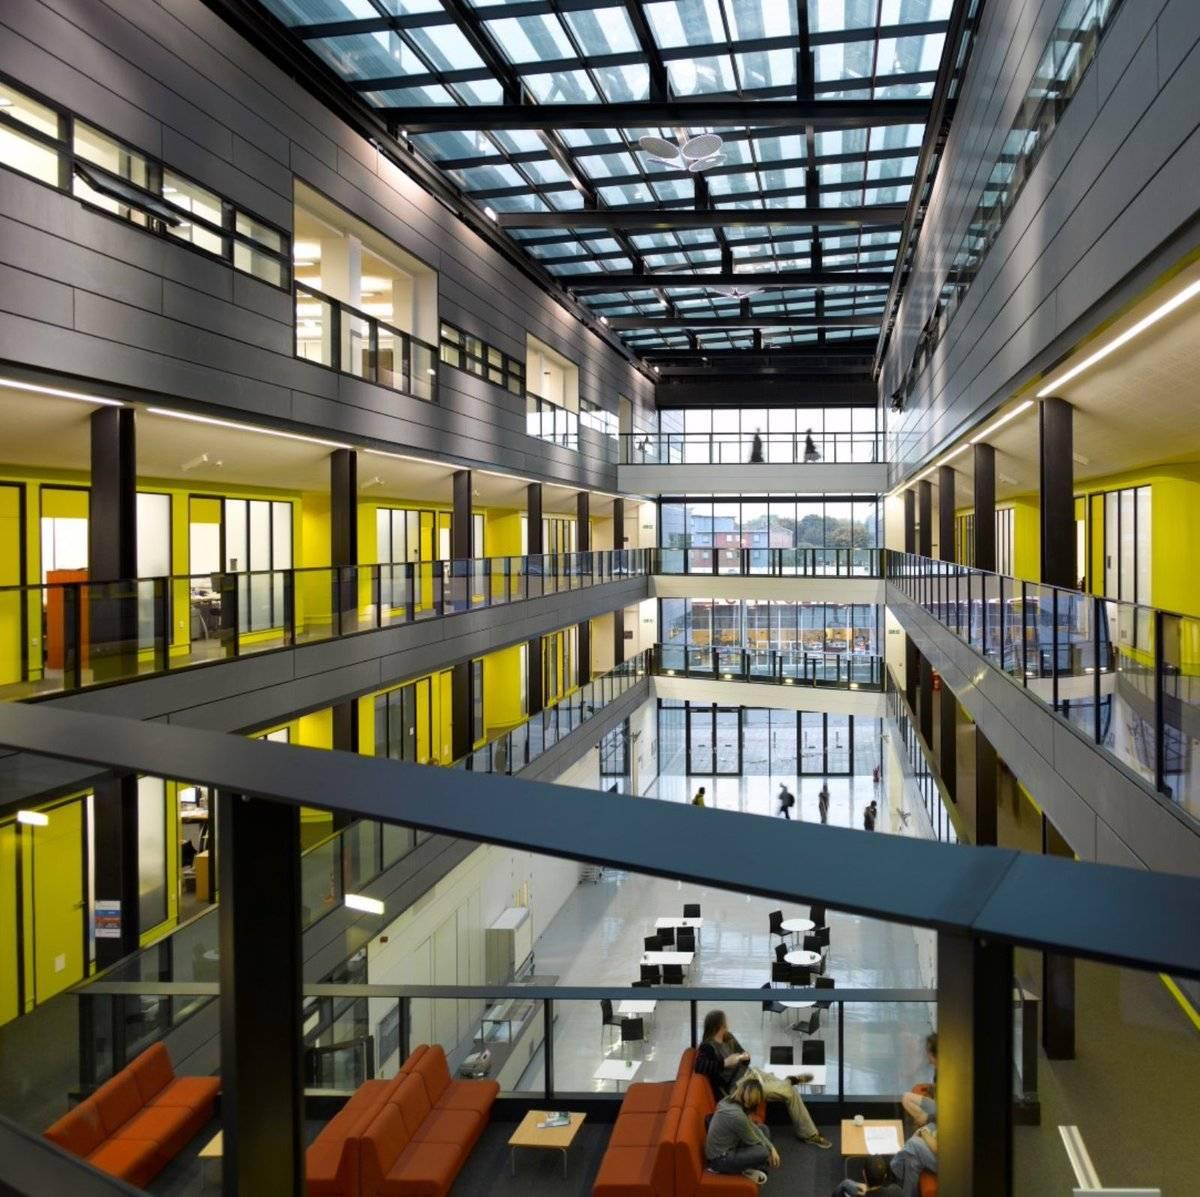 University of manchester (манчестерский университет)